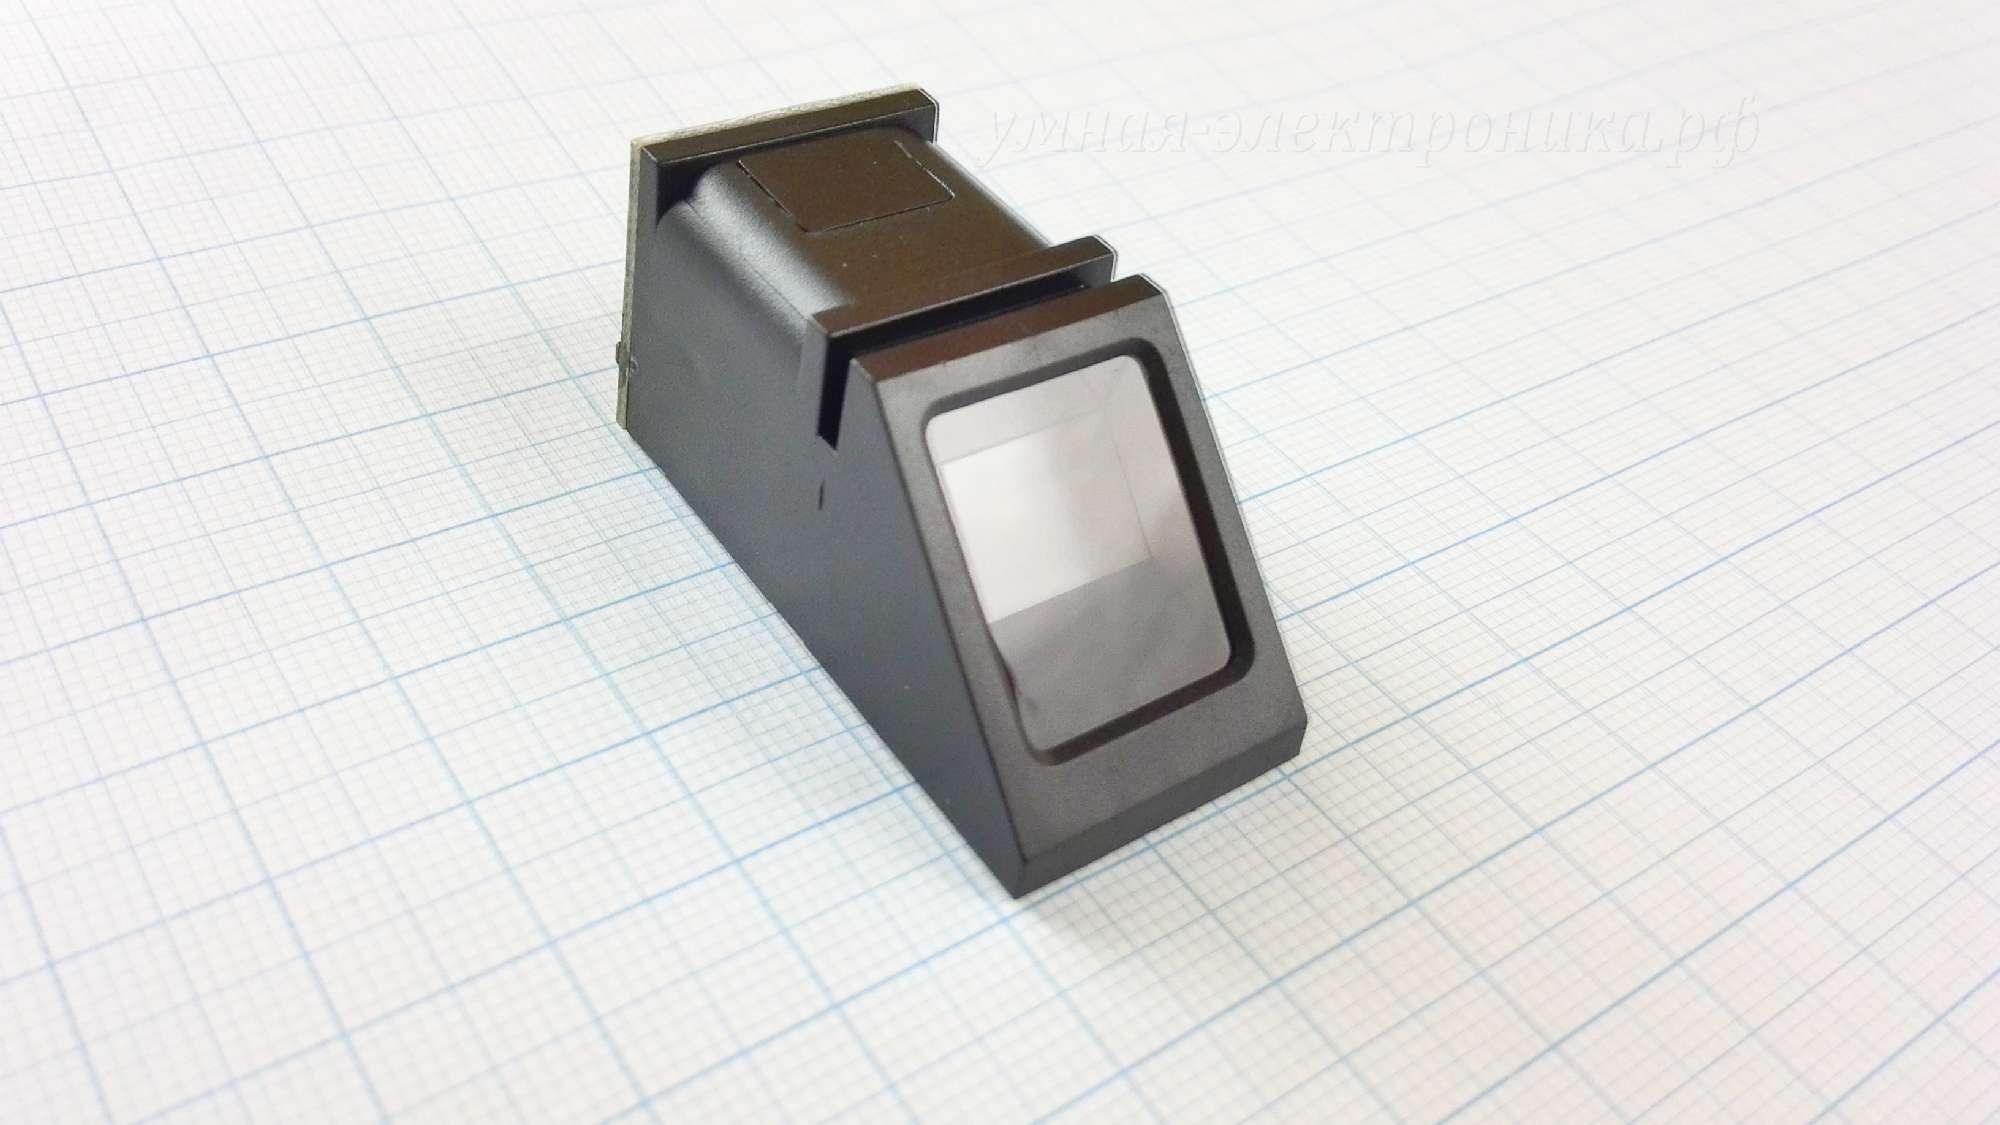 Сканер отпечатков пальцев Fingerprint Sensor AS606 500dpi 5V